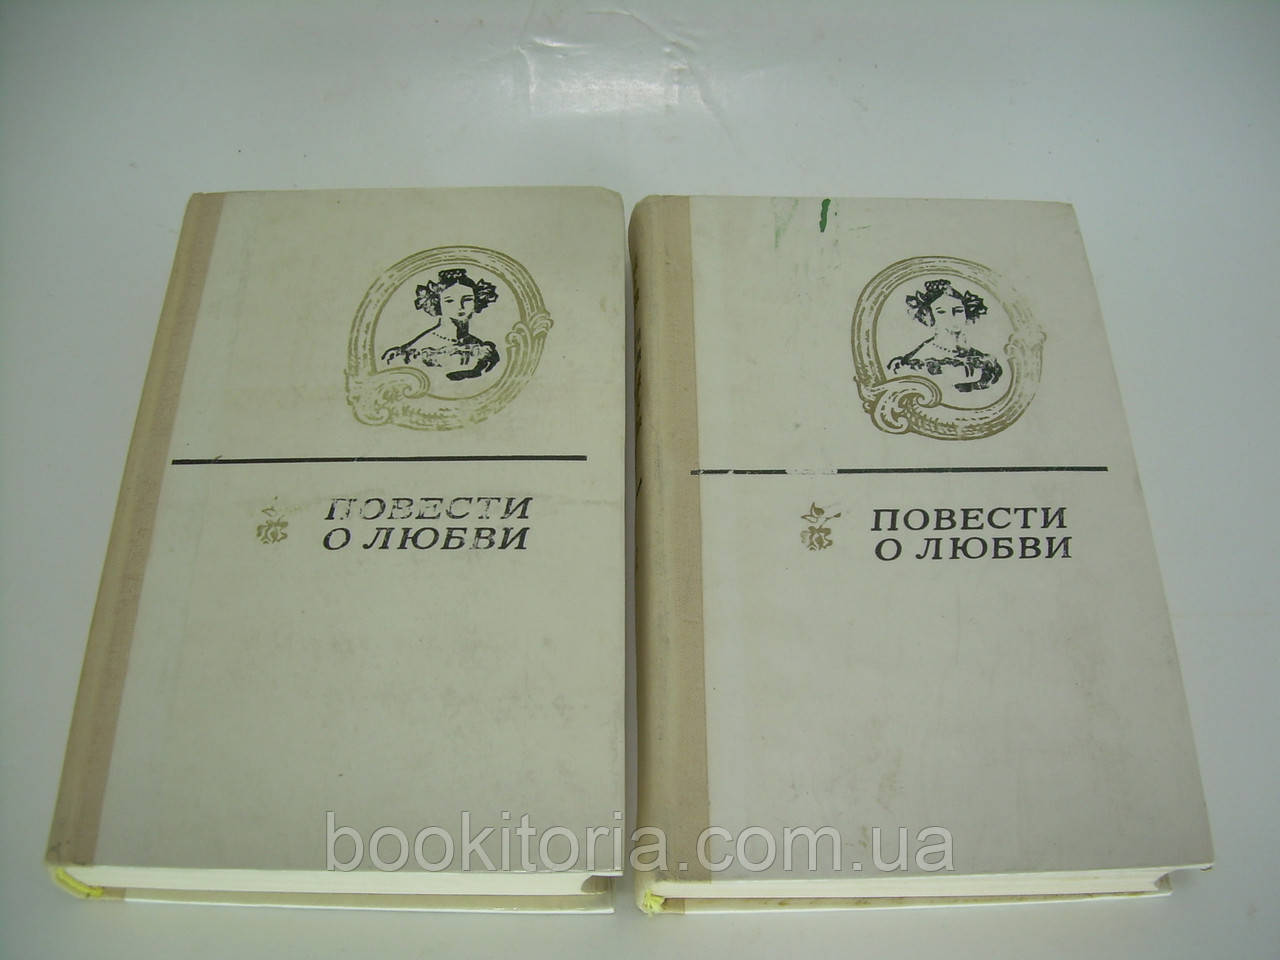 Повести о любви. Сборник в двух томах (б/у).